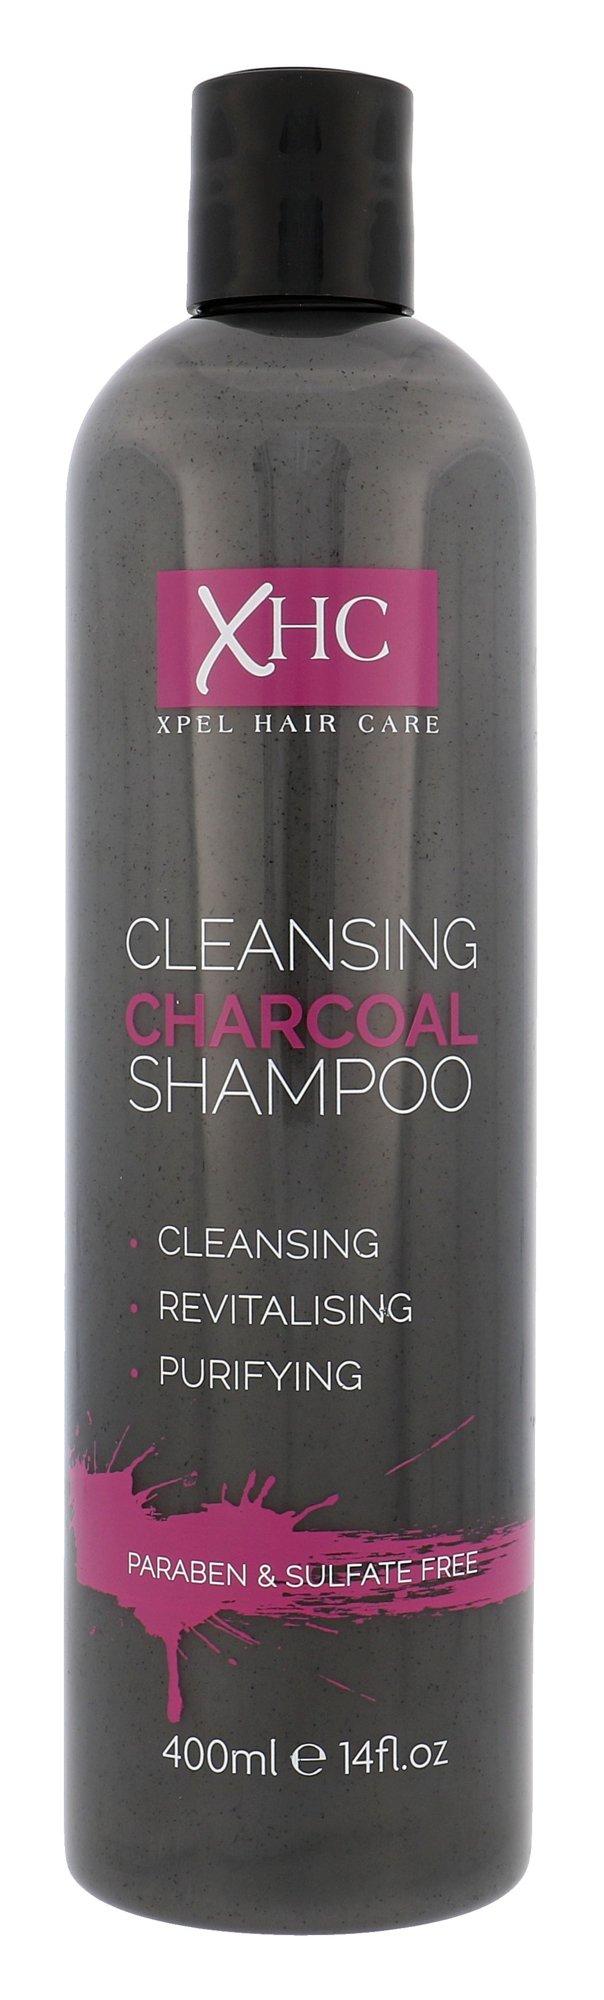 Xpel Charcoal Cosmetic 400ml  Charcoal